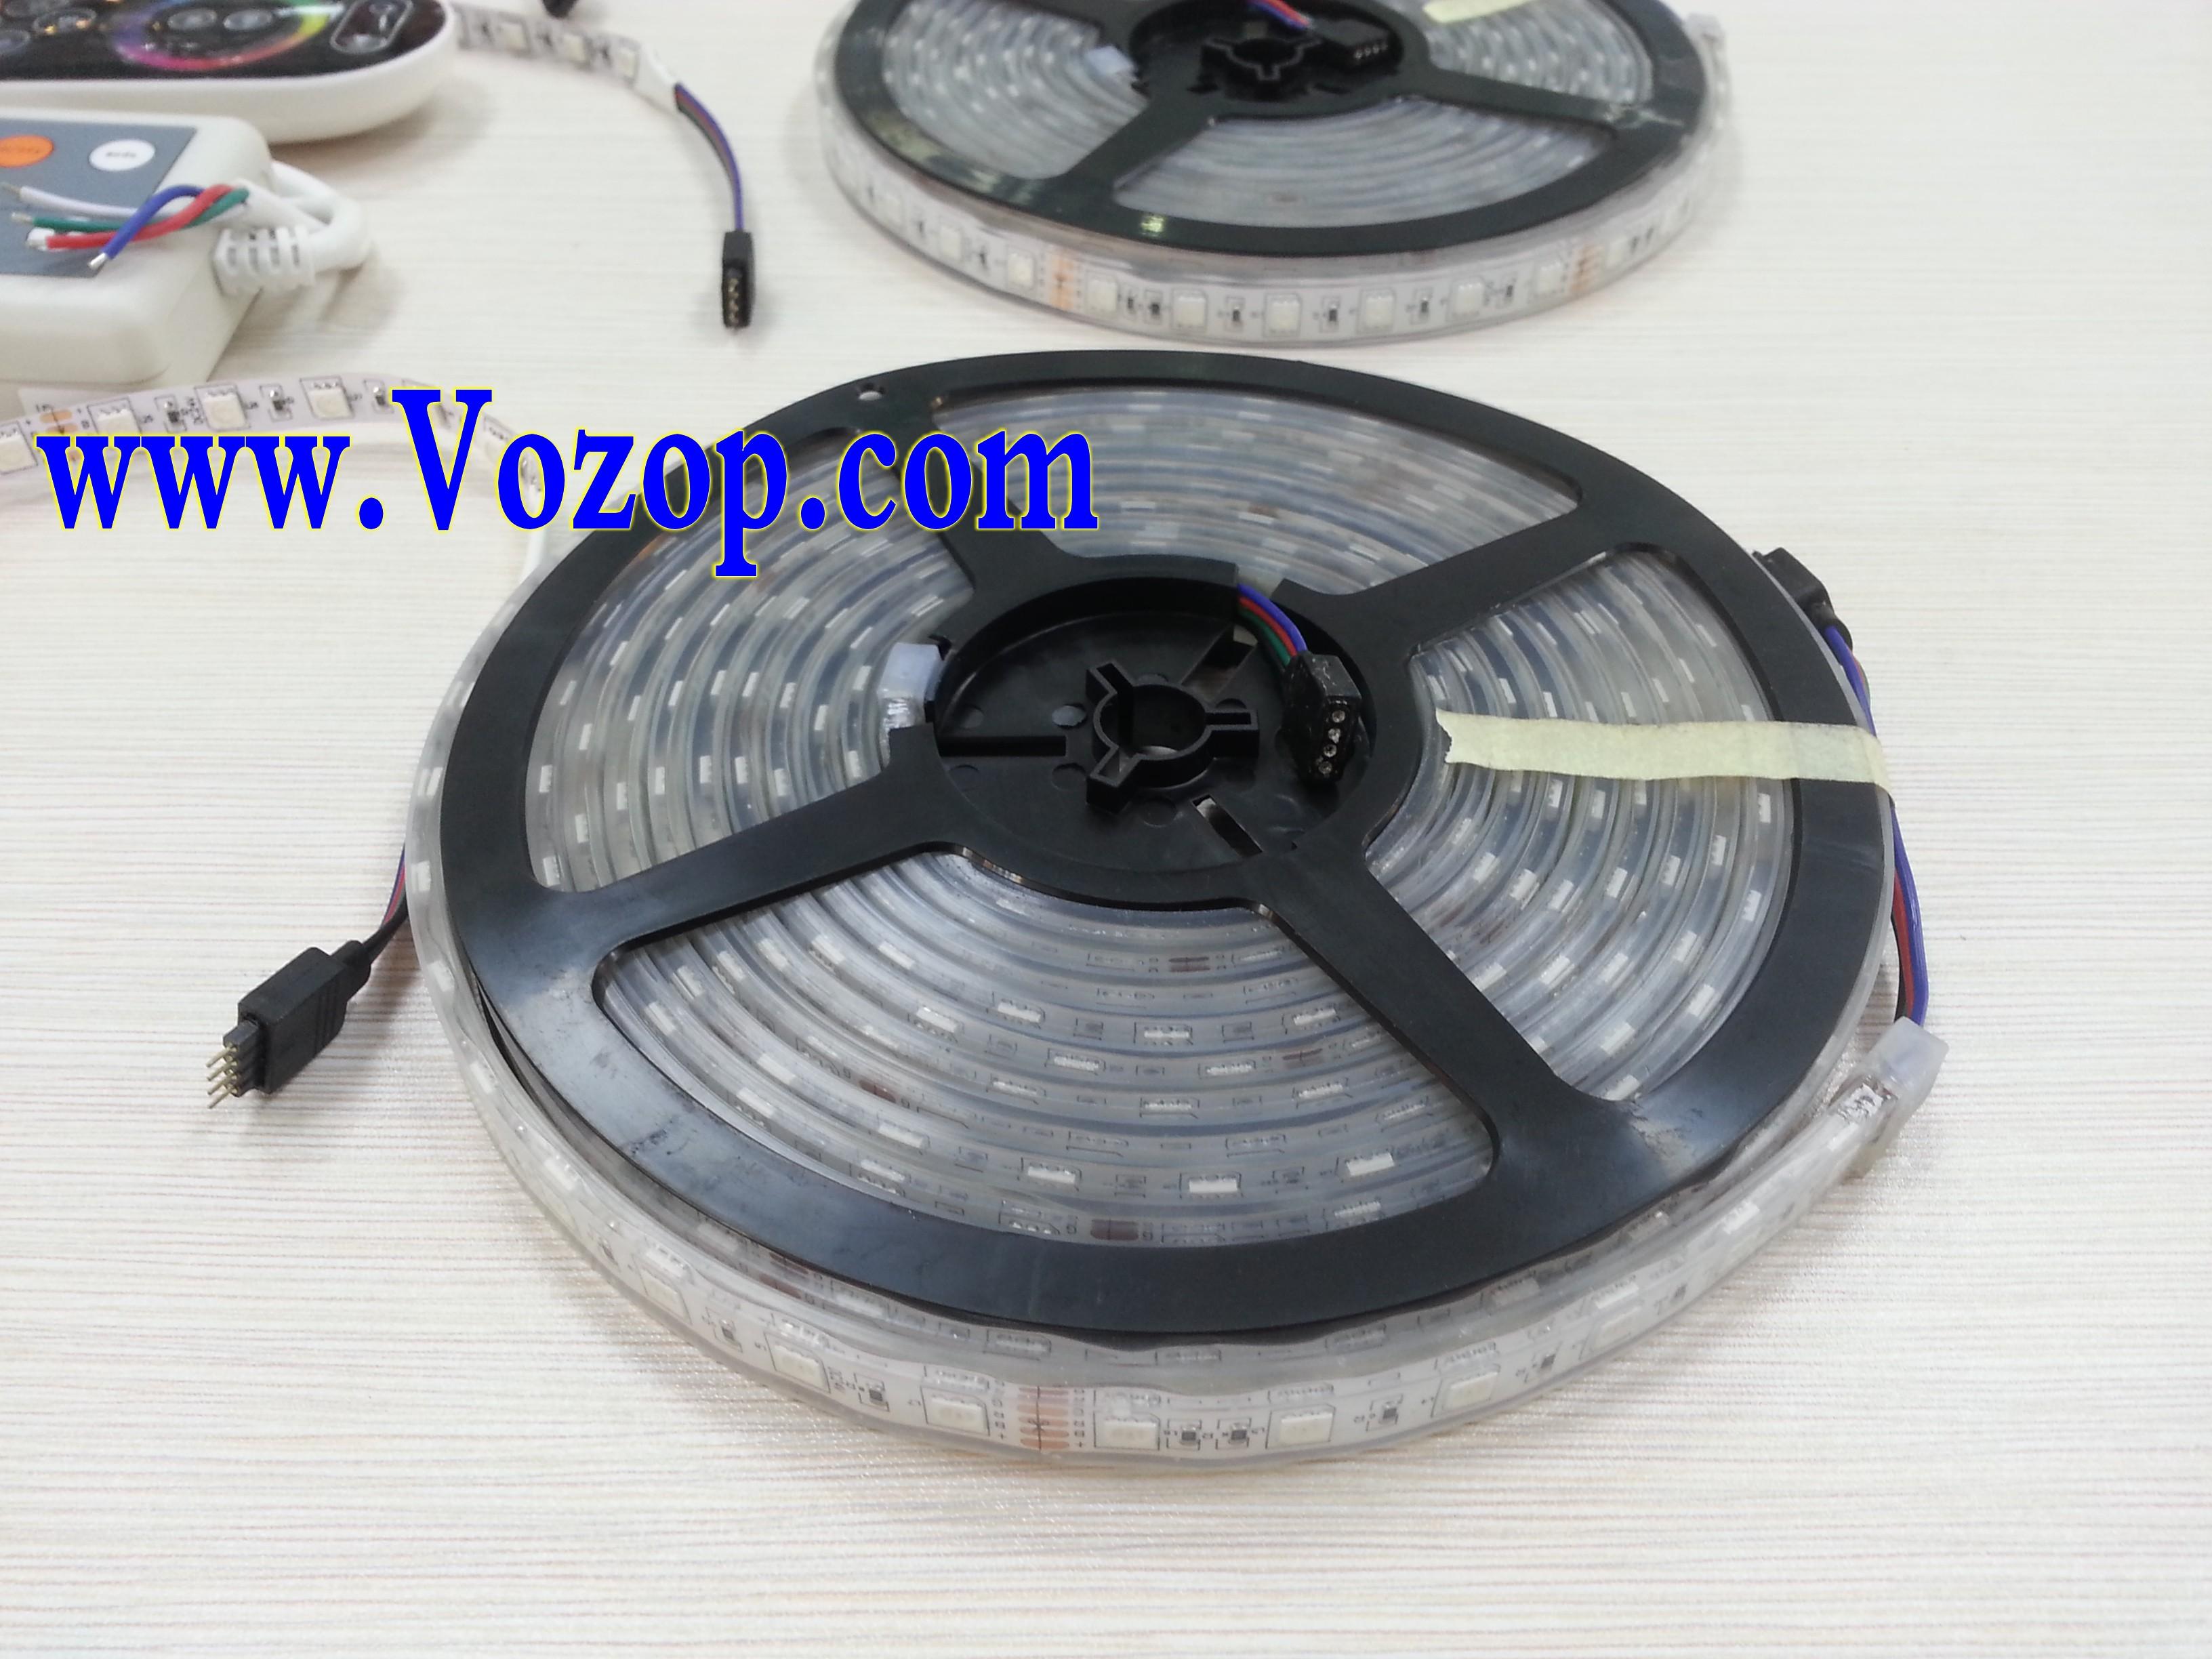 16.4_Ft_IP68_waterproof_RGB_LED_tape_Strip_light